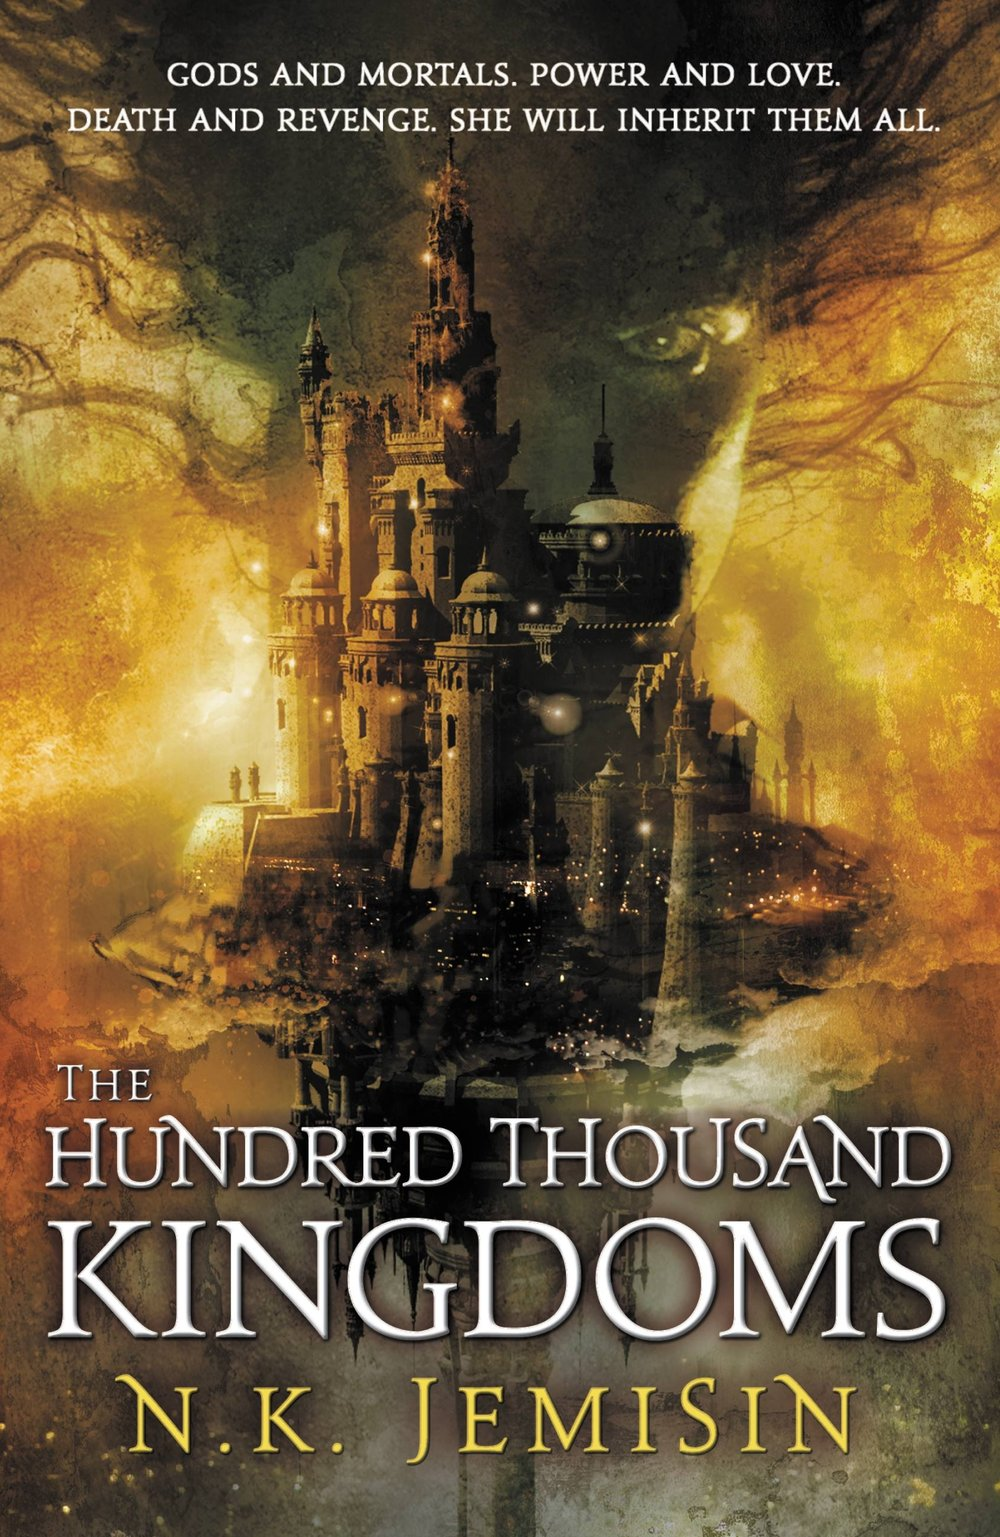 The Hundred Thousand Kingdoms , by N.K. Jemisin